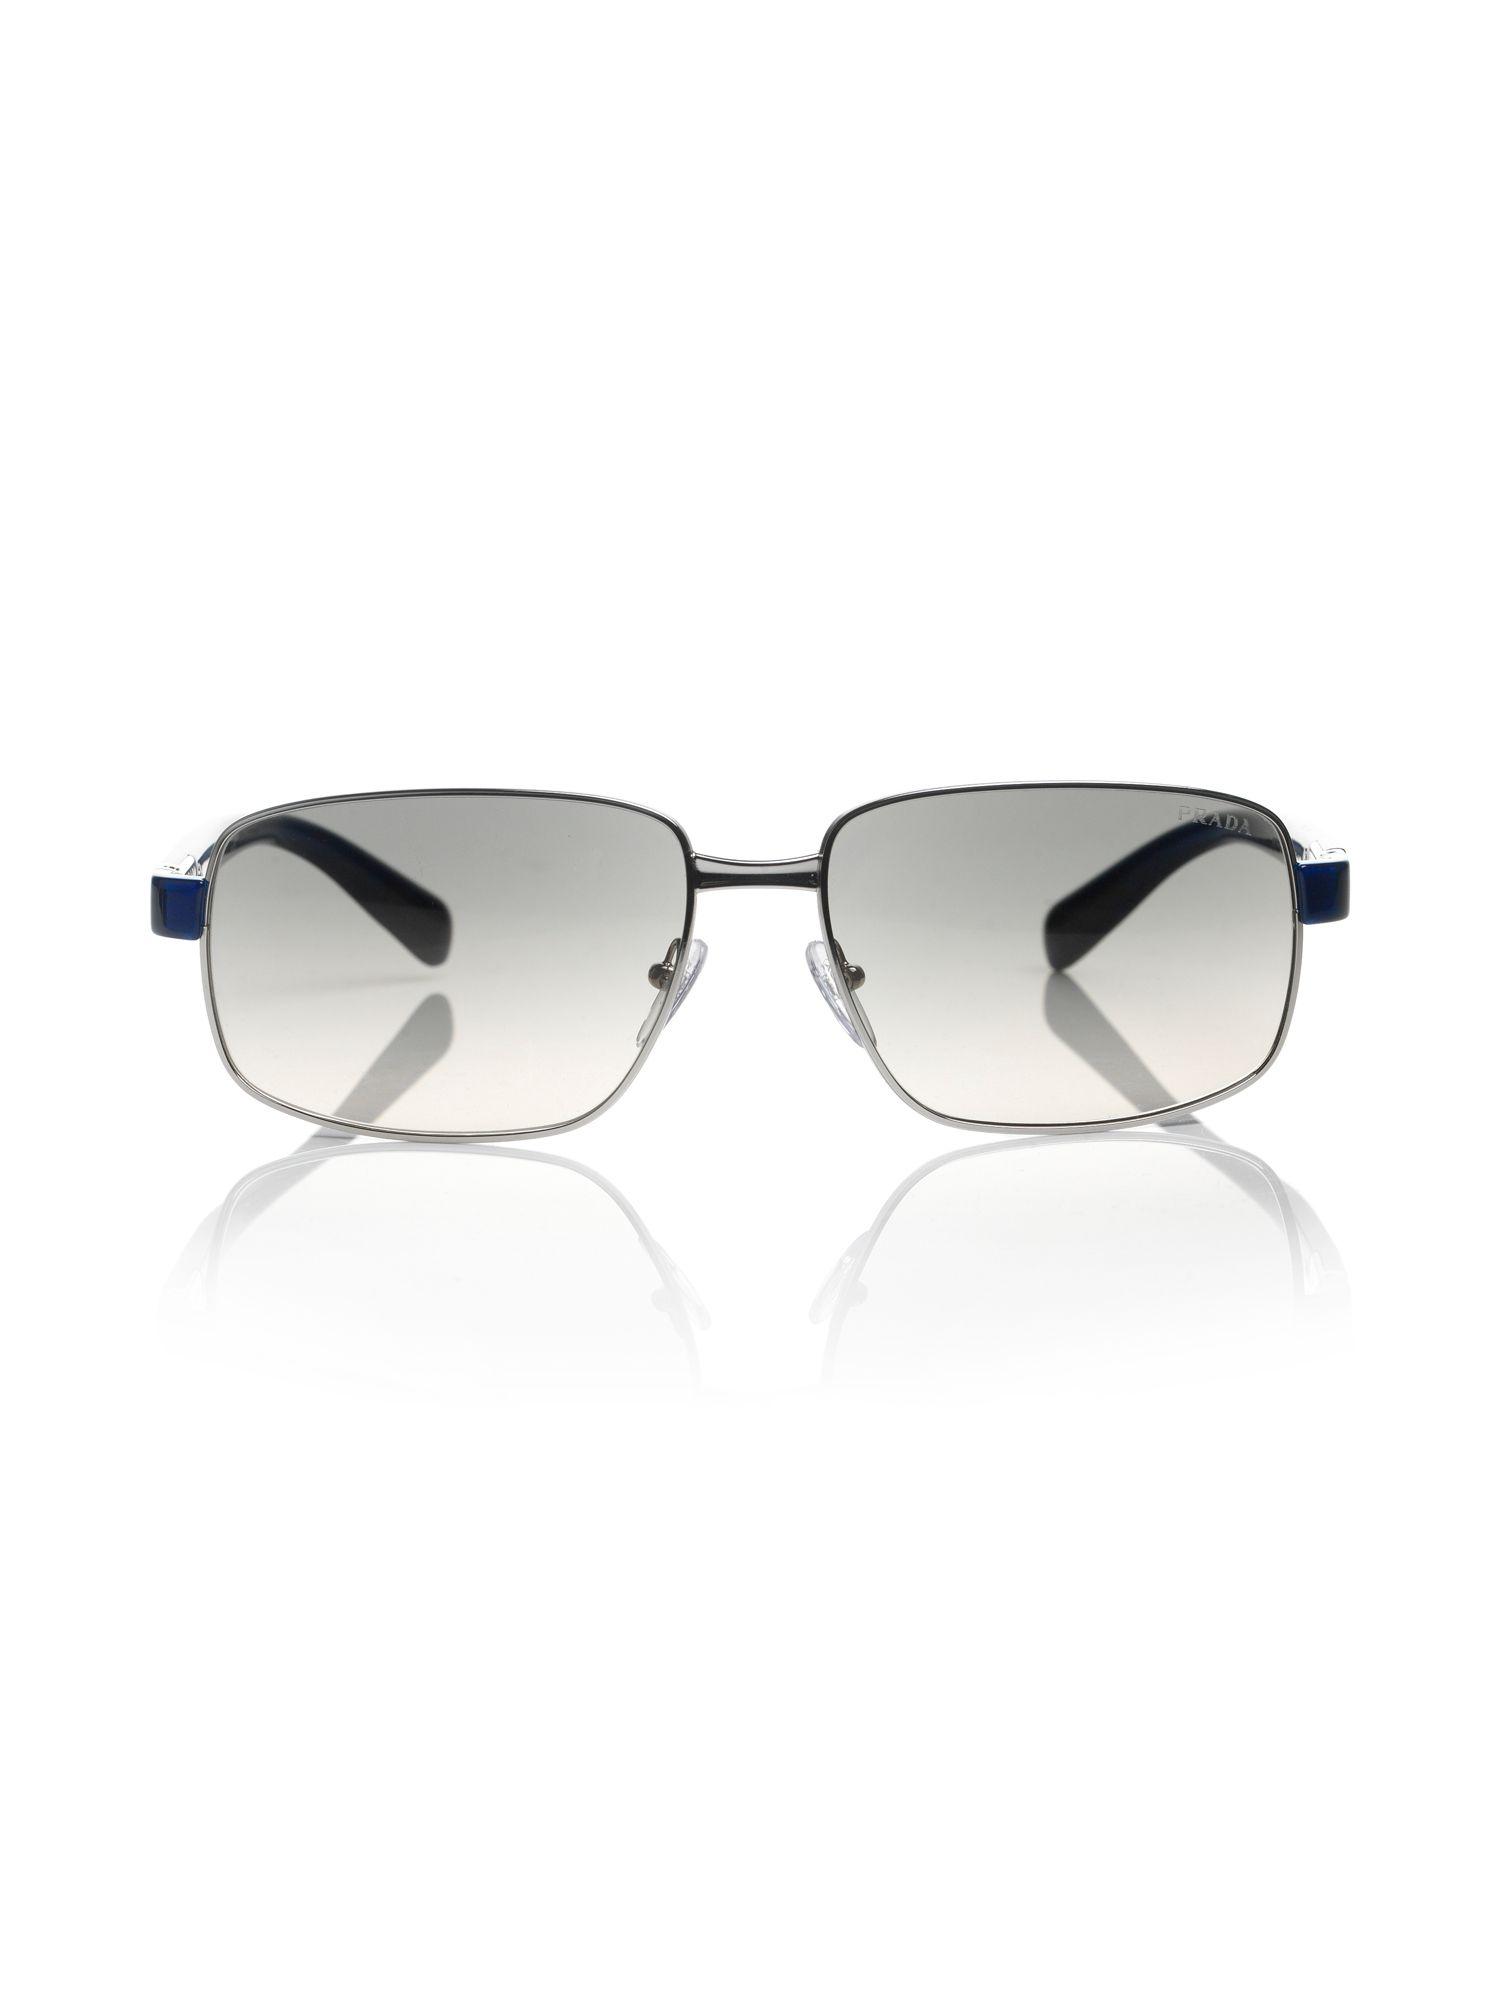 300d25cb7e7 Mens Prada Sunglasses White Frame - Bitterroot Public Library